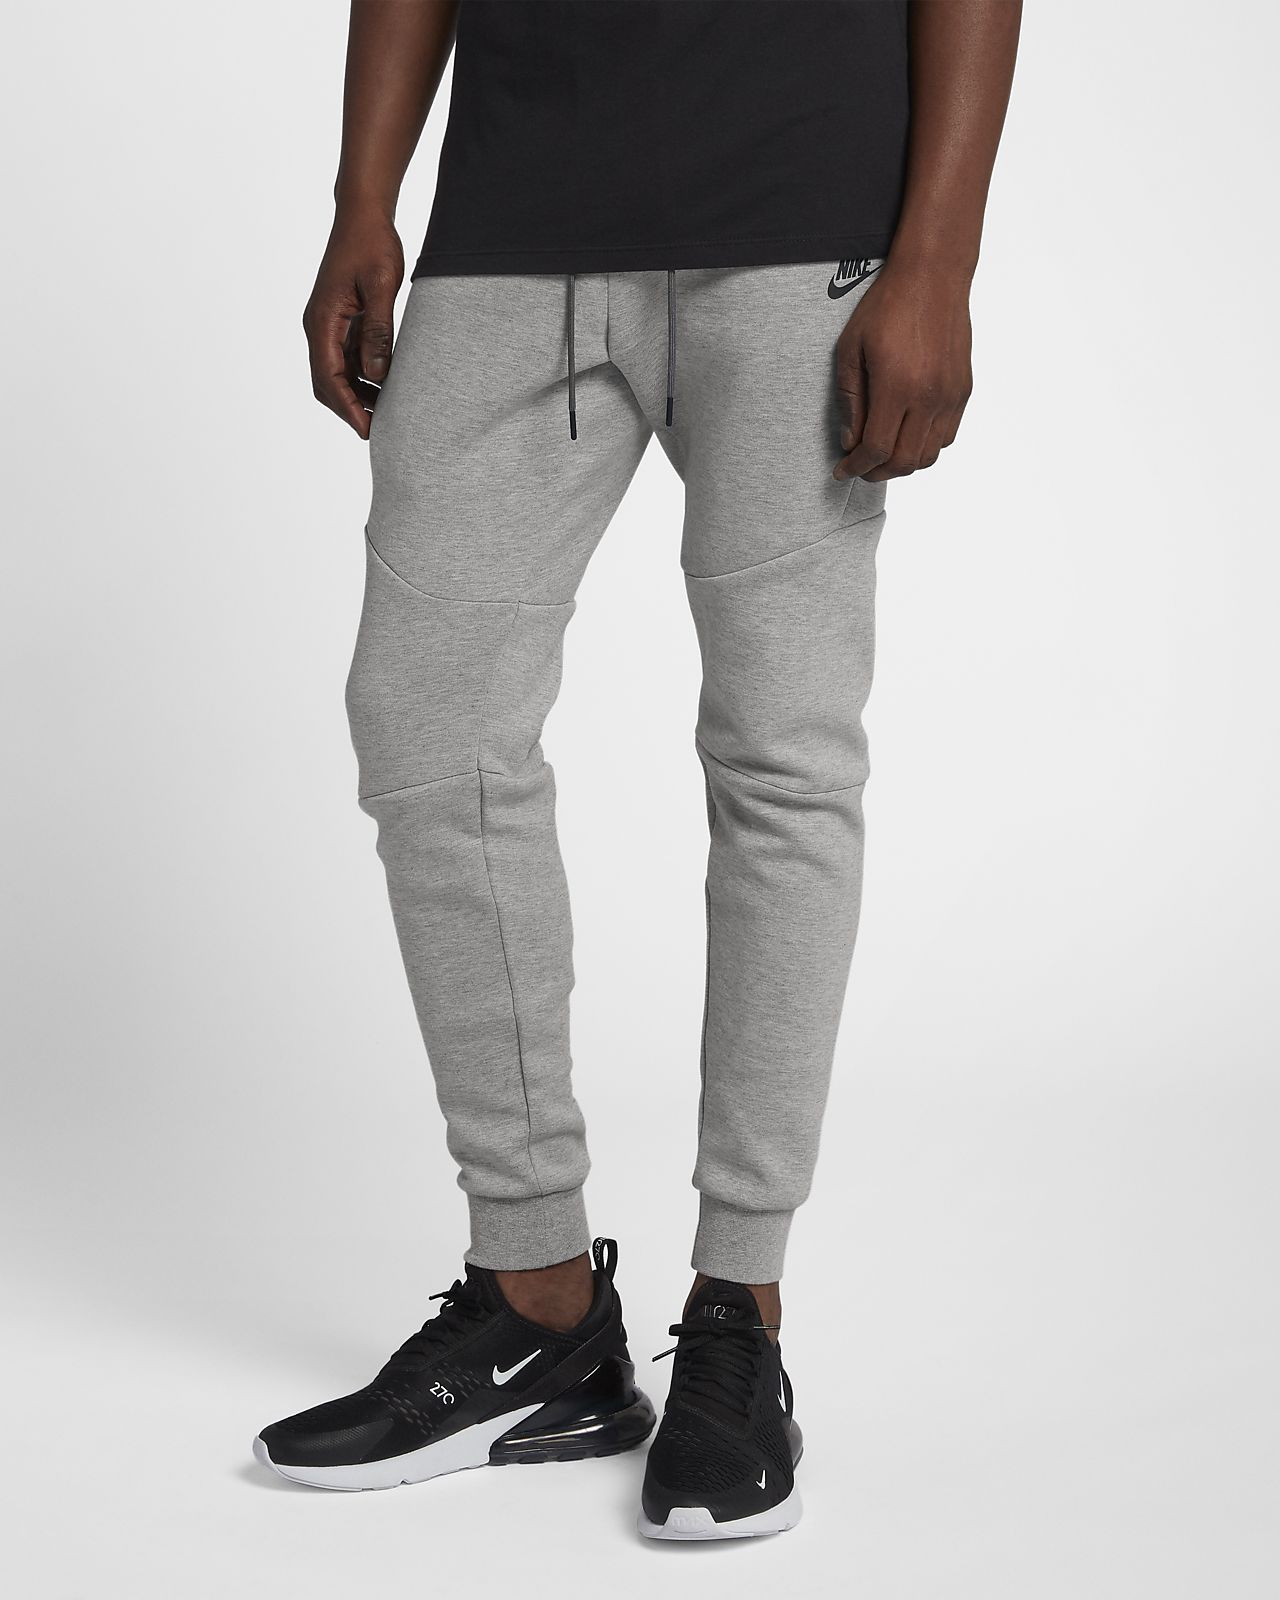 b5b20c9d802af Pantalon Nike Tech Fleece Hombre – Sólo otra idea de imagen de muebles